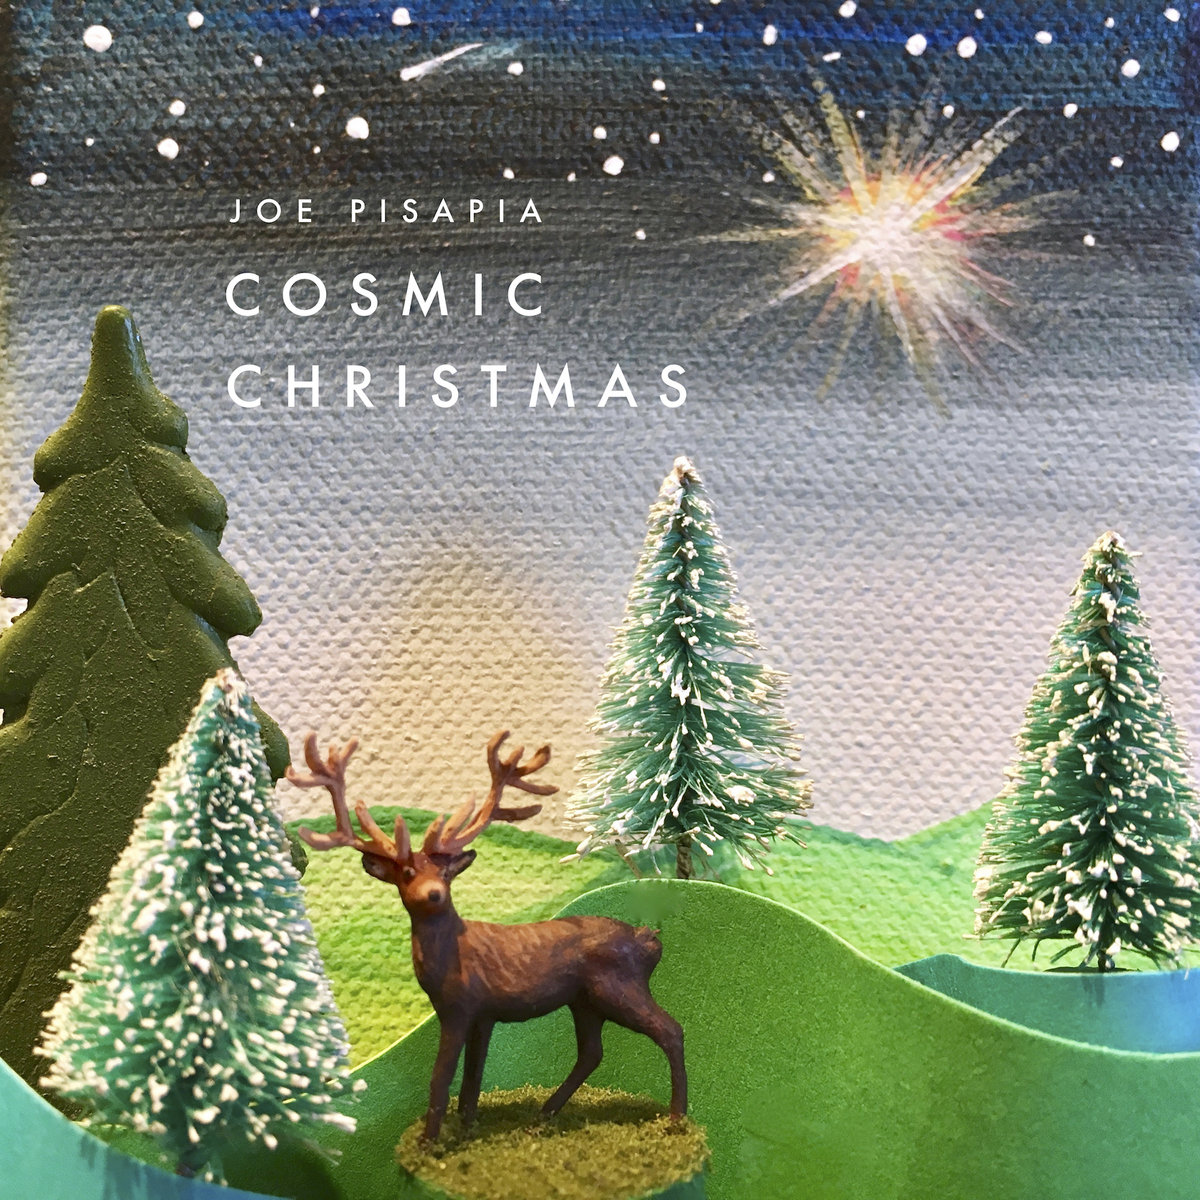 Cosmic Christmas | Joe Pisapia